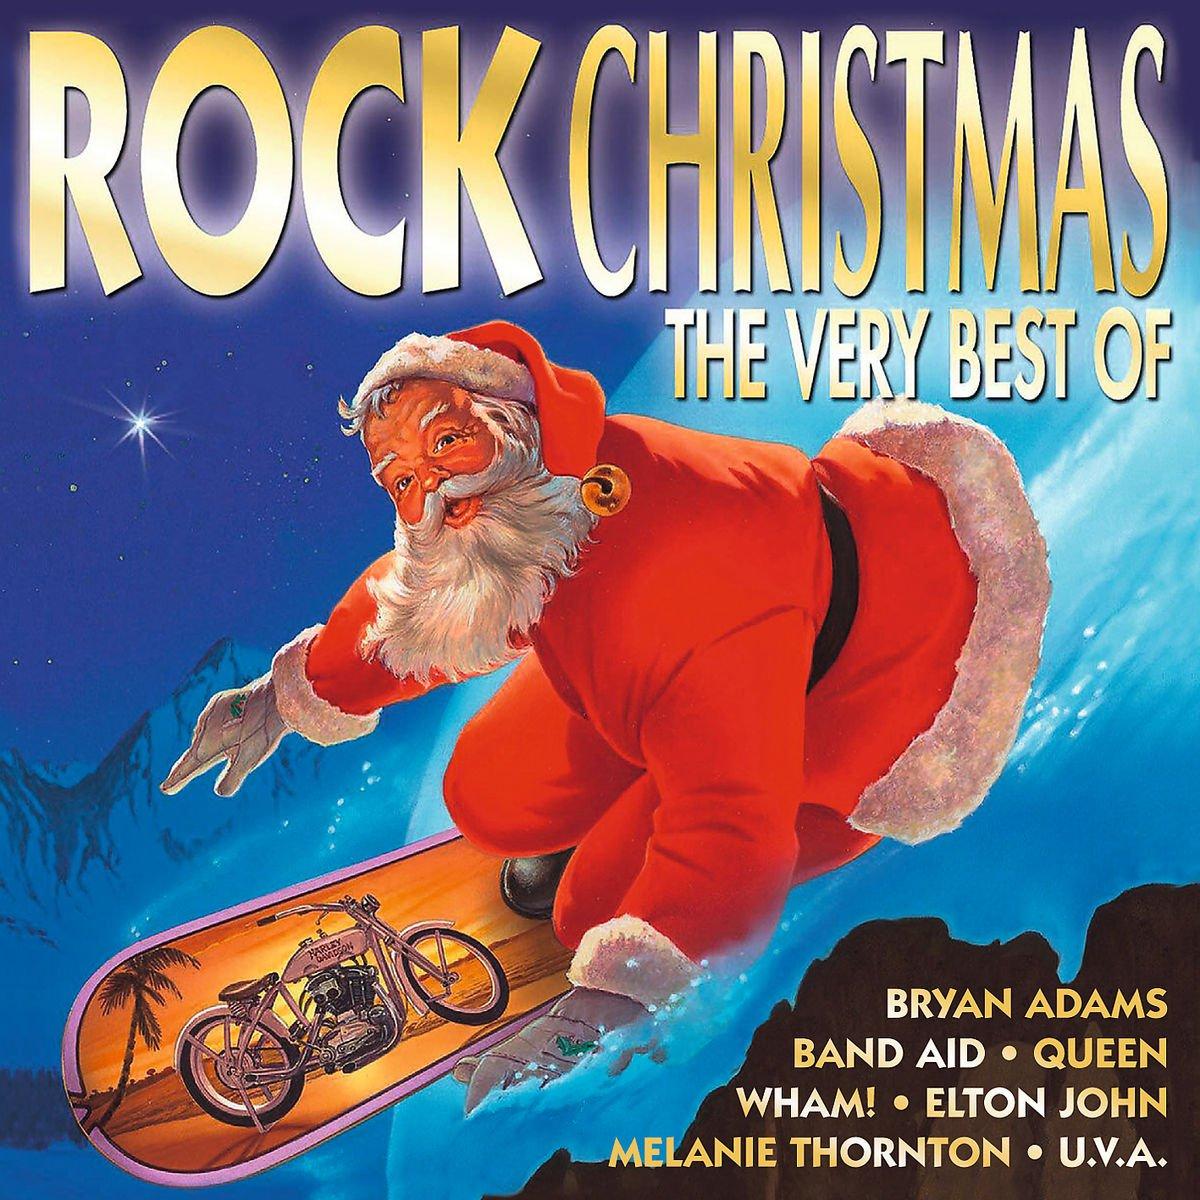 Rock Christmas - The Very Best Of - Various: Amazon.de: Musik